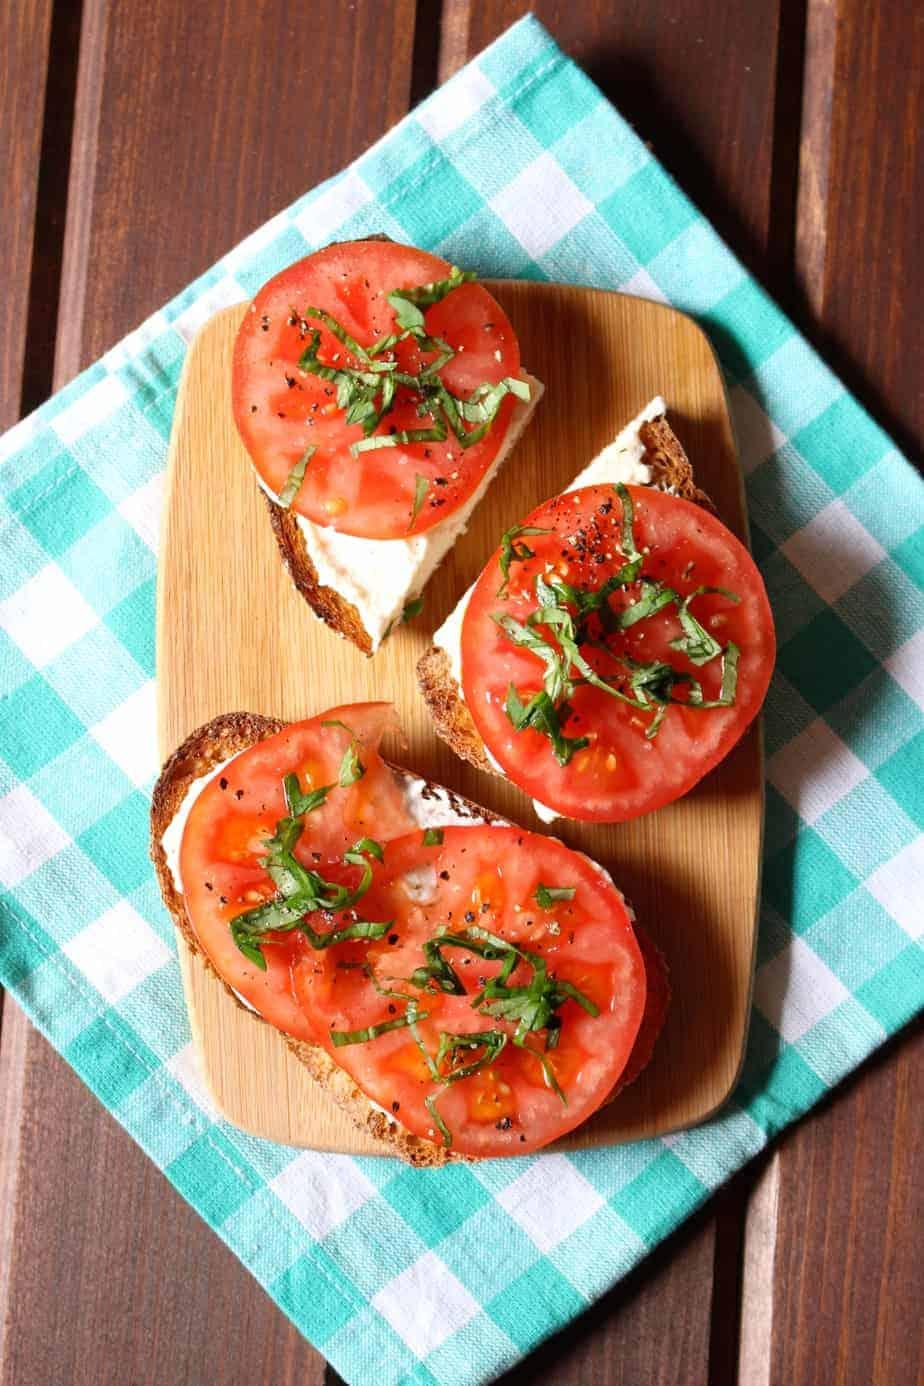 Garlic Ricotta, Tomatoes, Basil on Toast | Frugal Nutrition